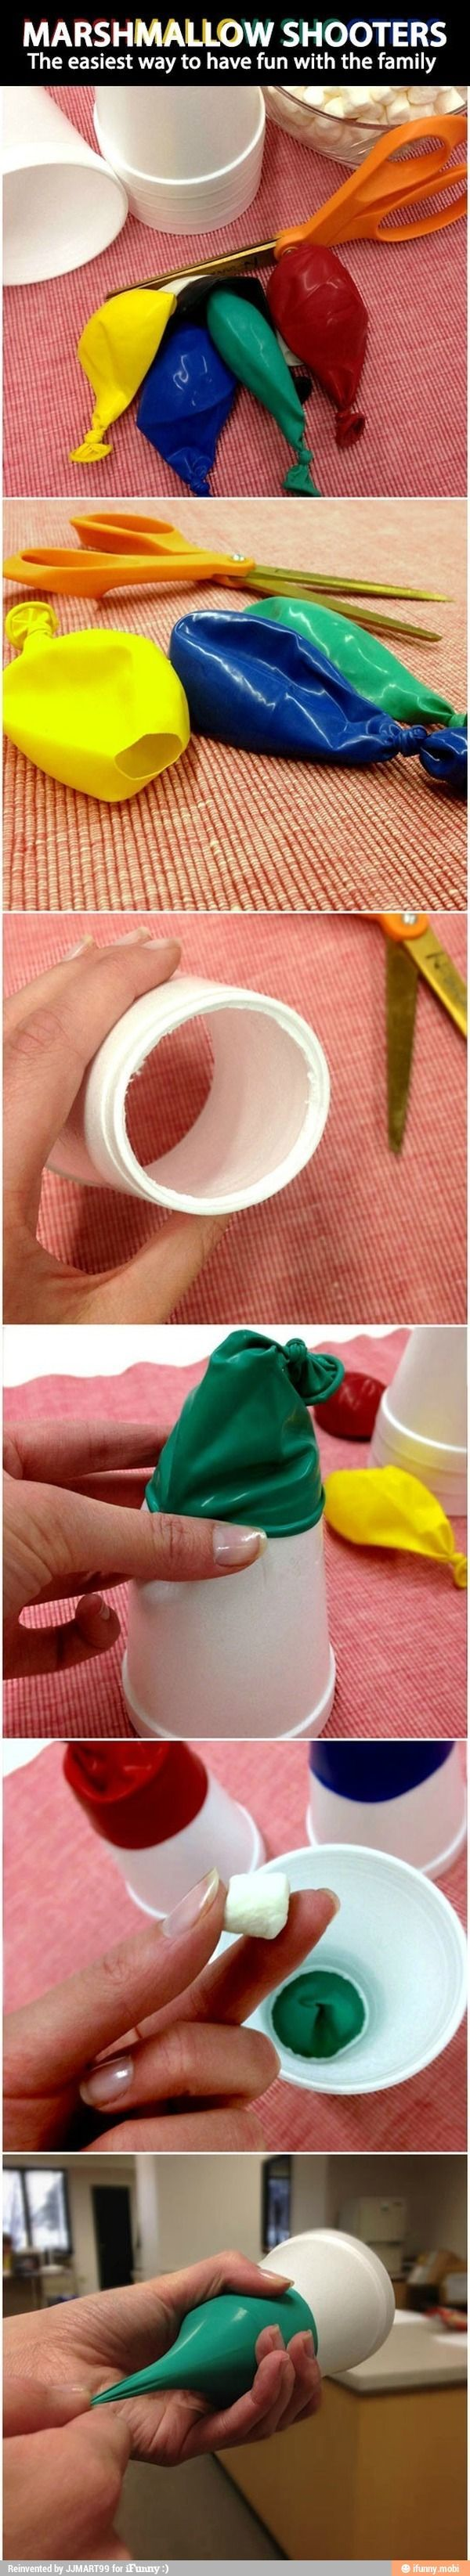 Marshmallow shooters / iFunny :)